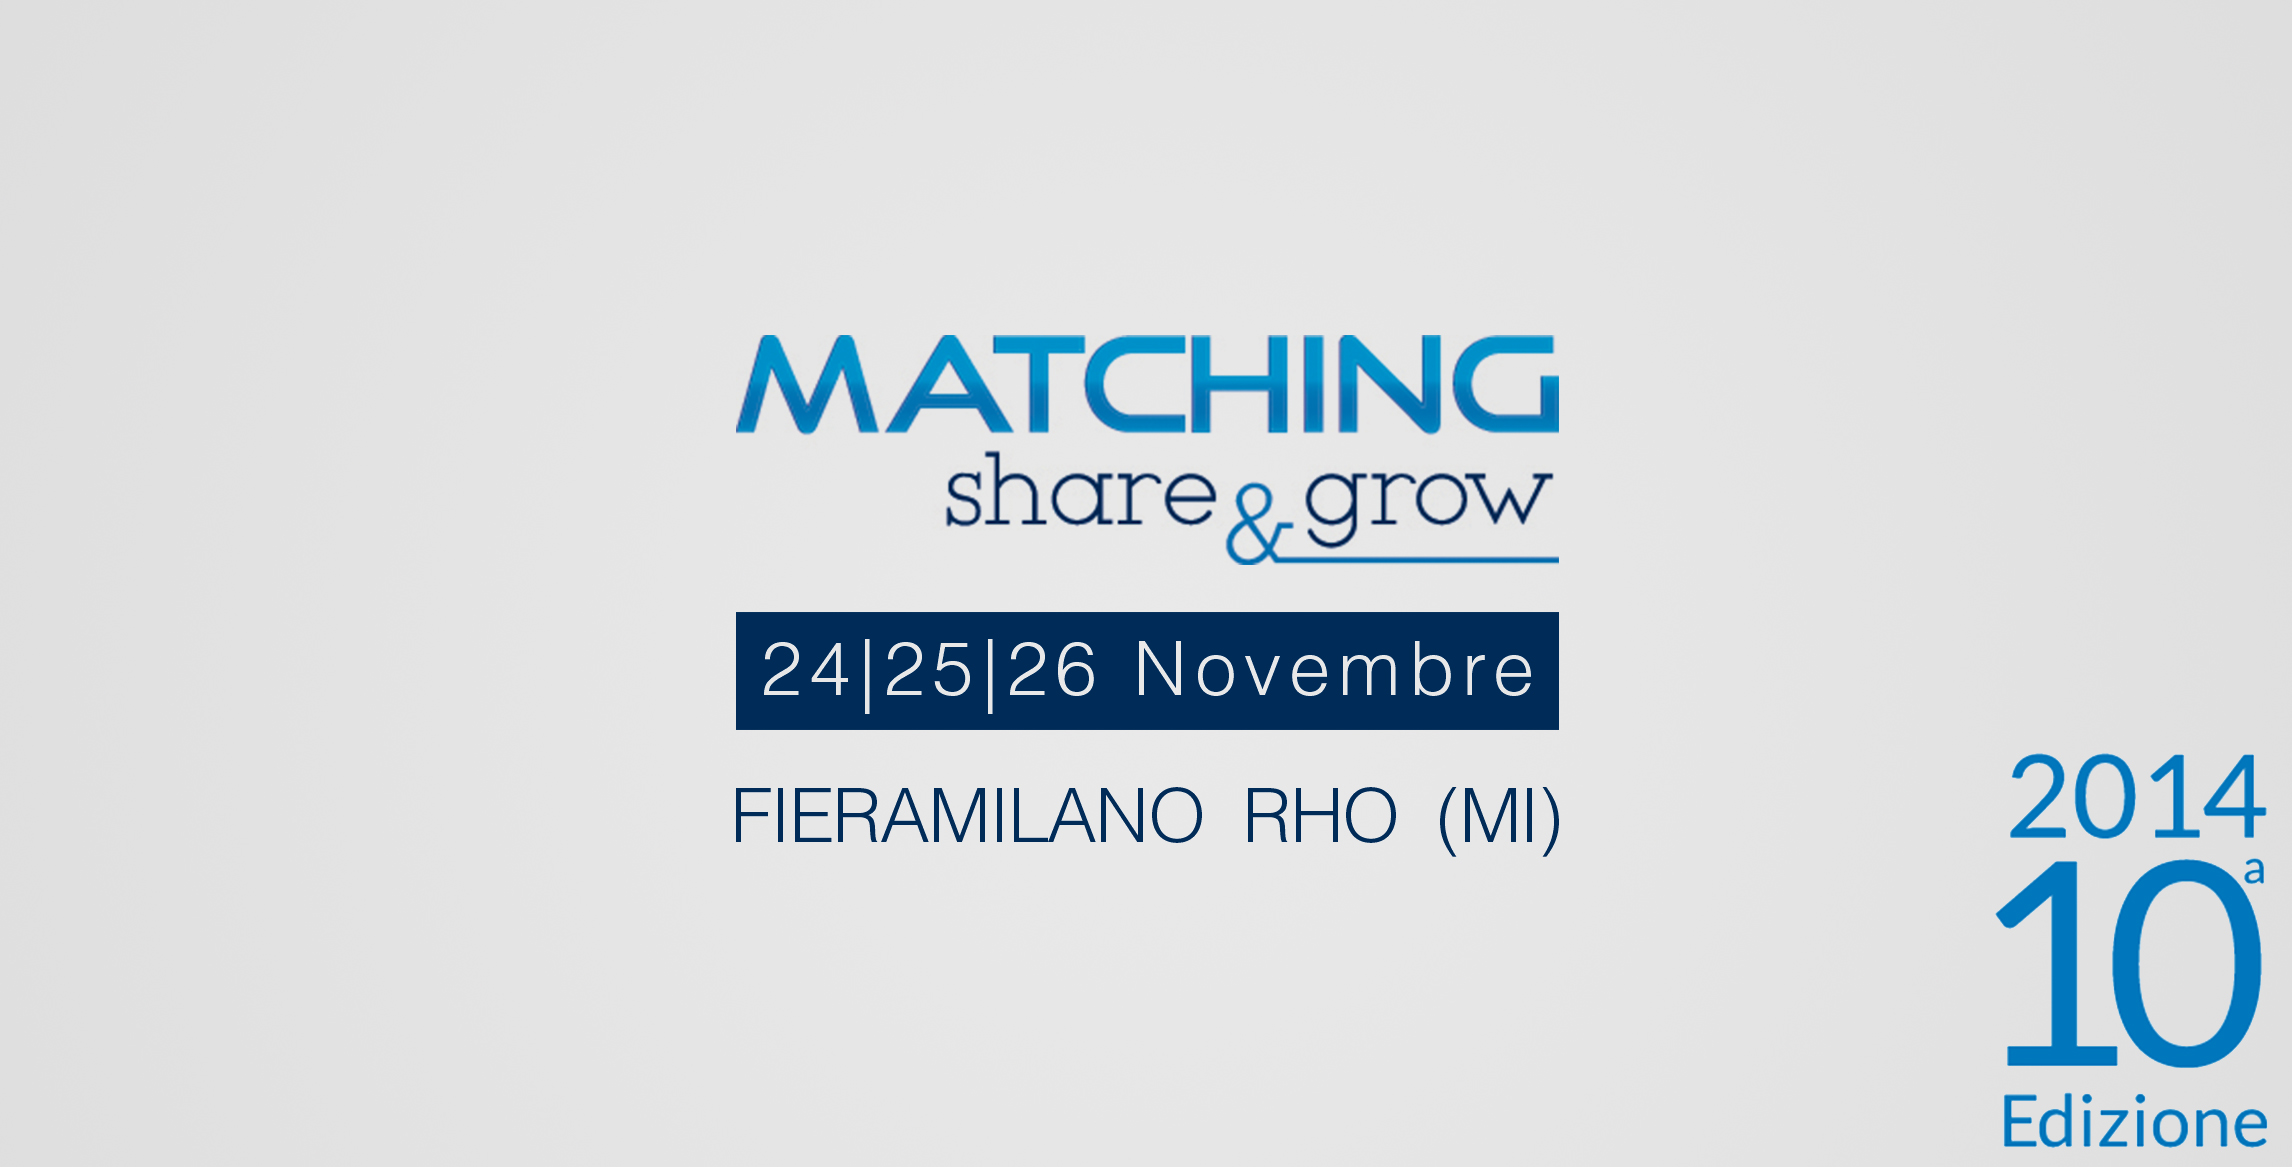 Matching 2014